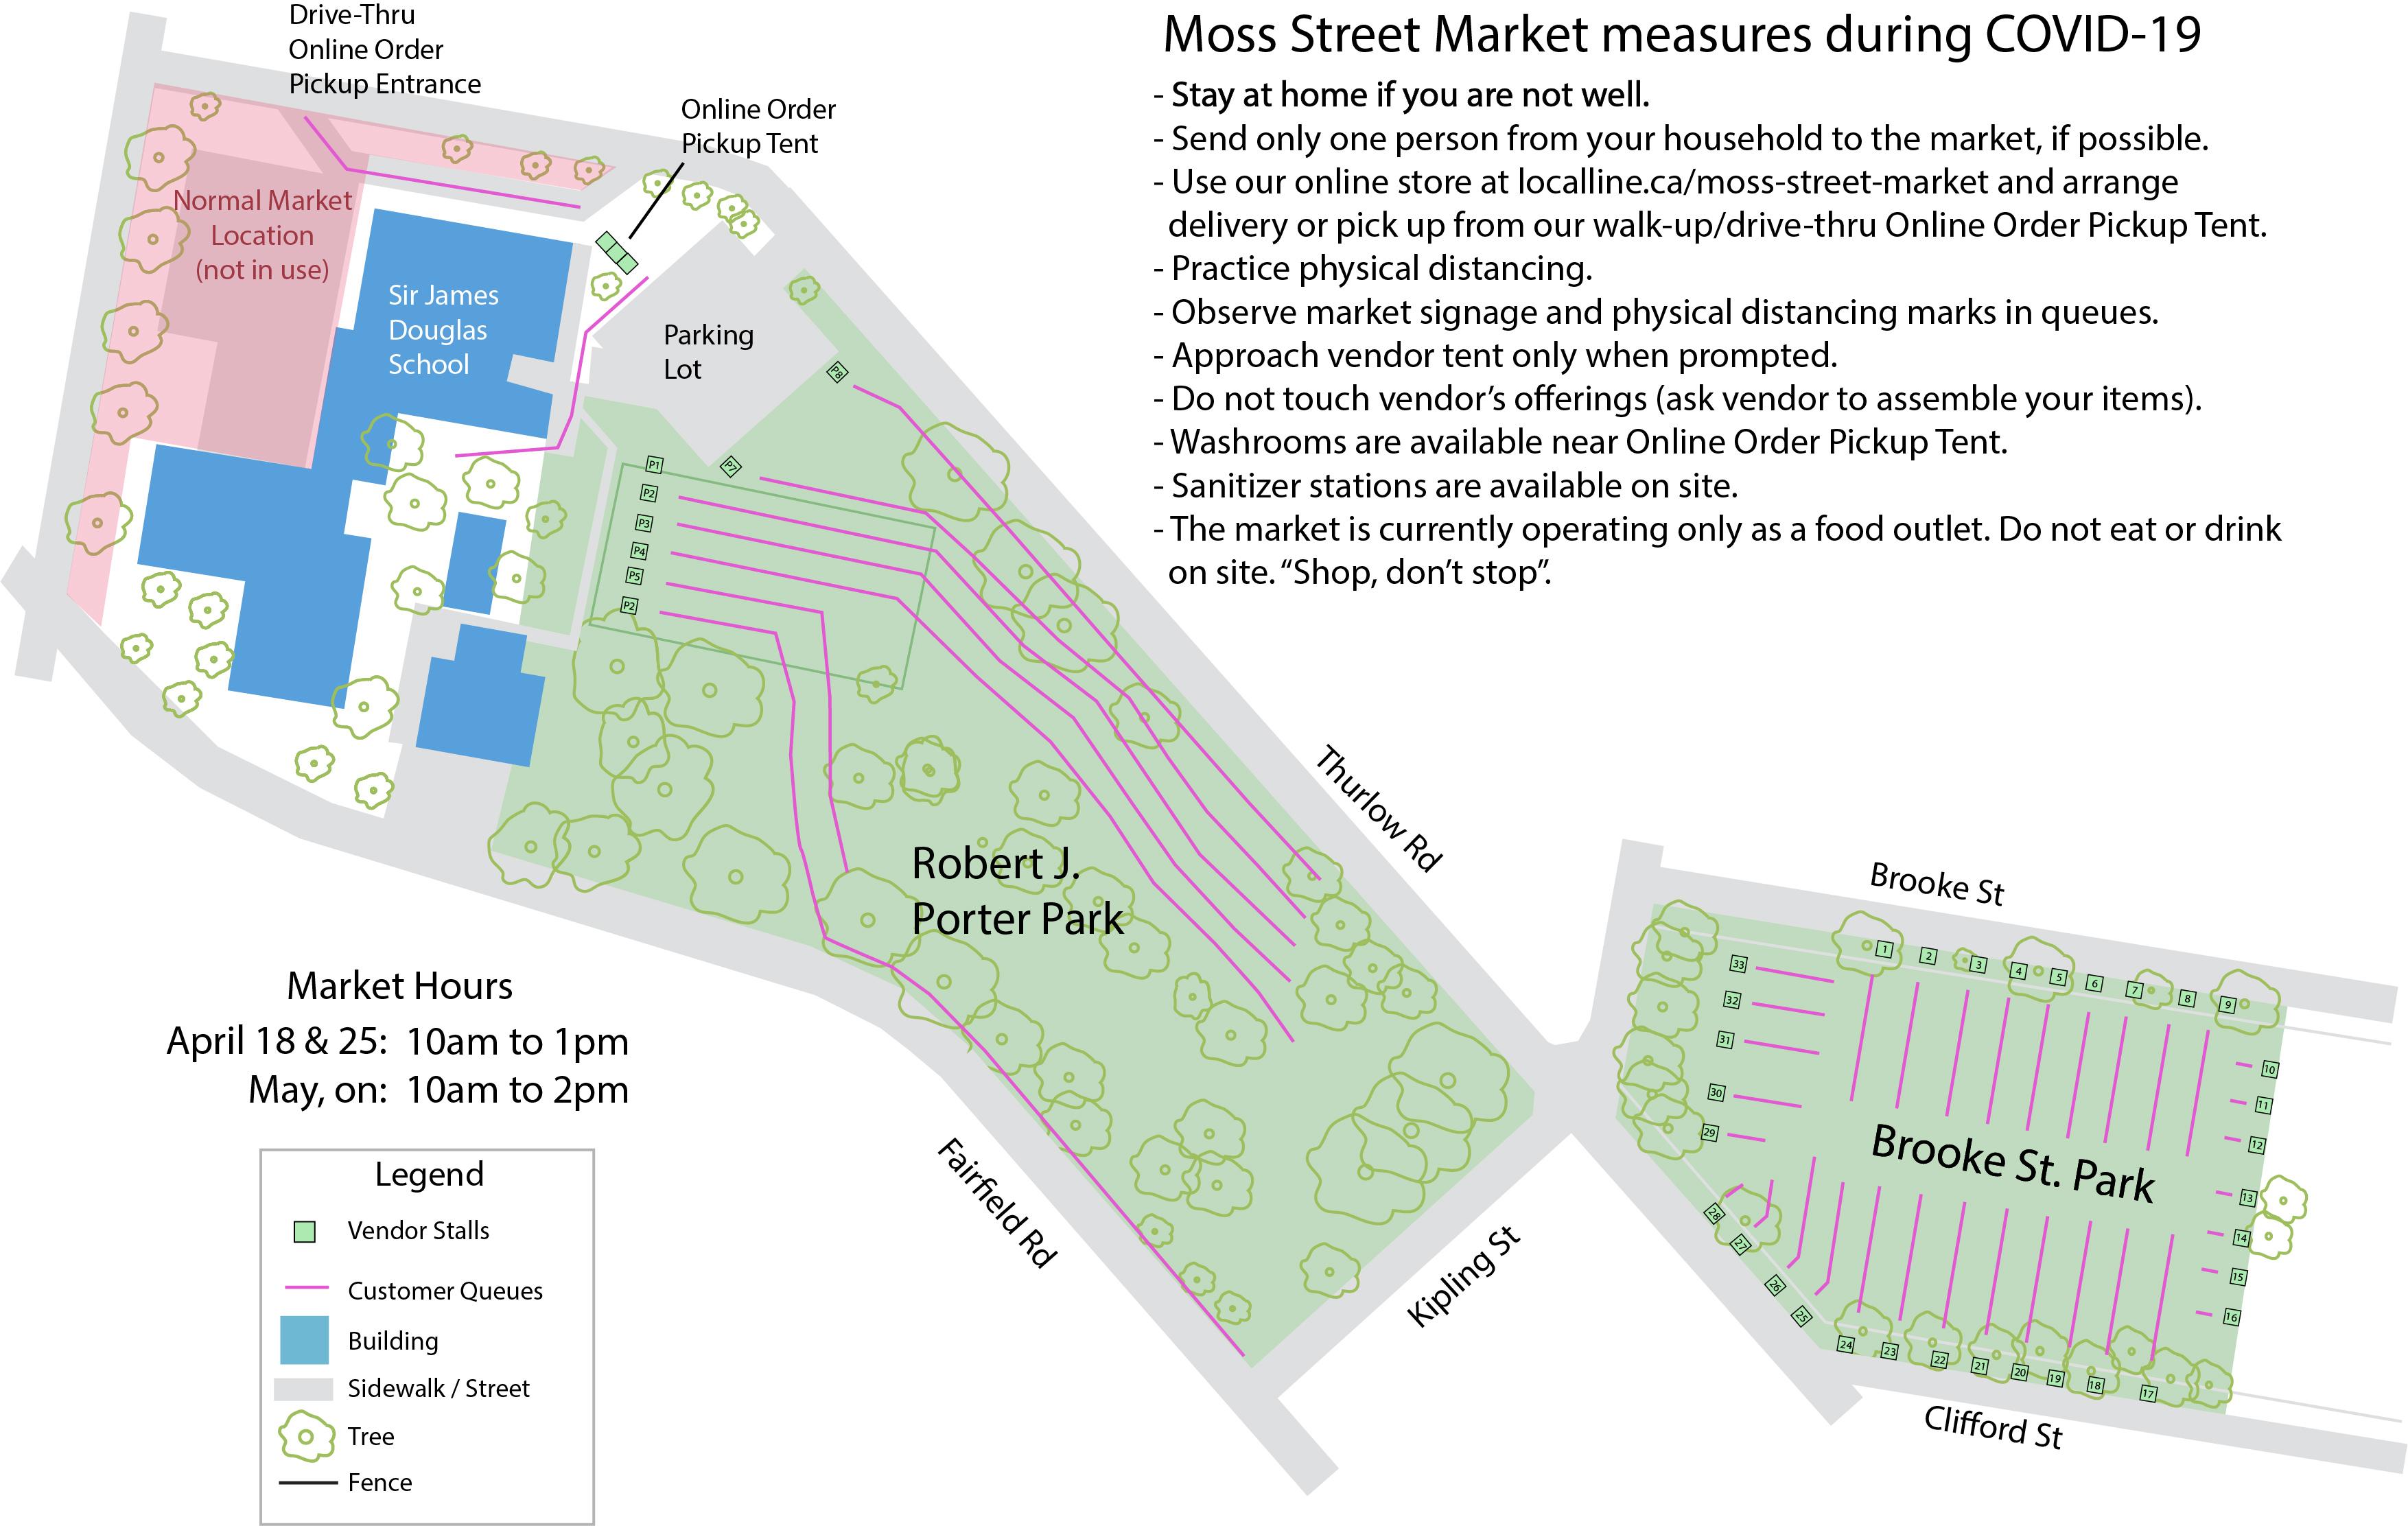 Porter Park & Brooke Street Park Map